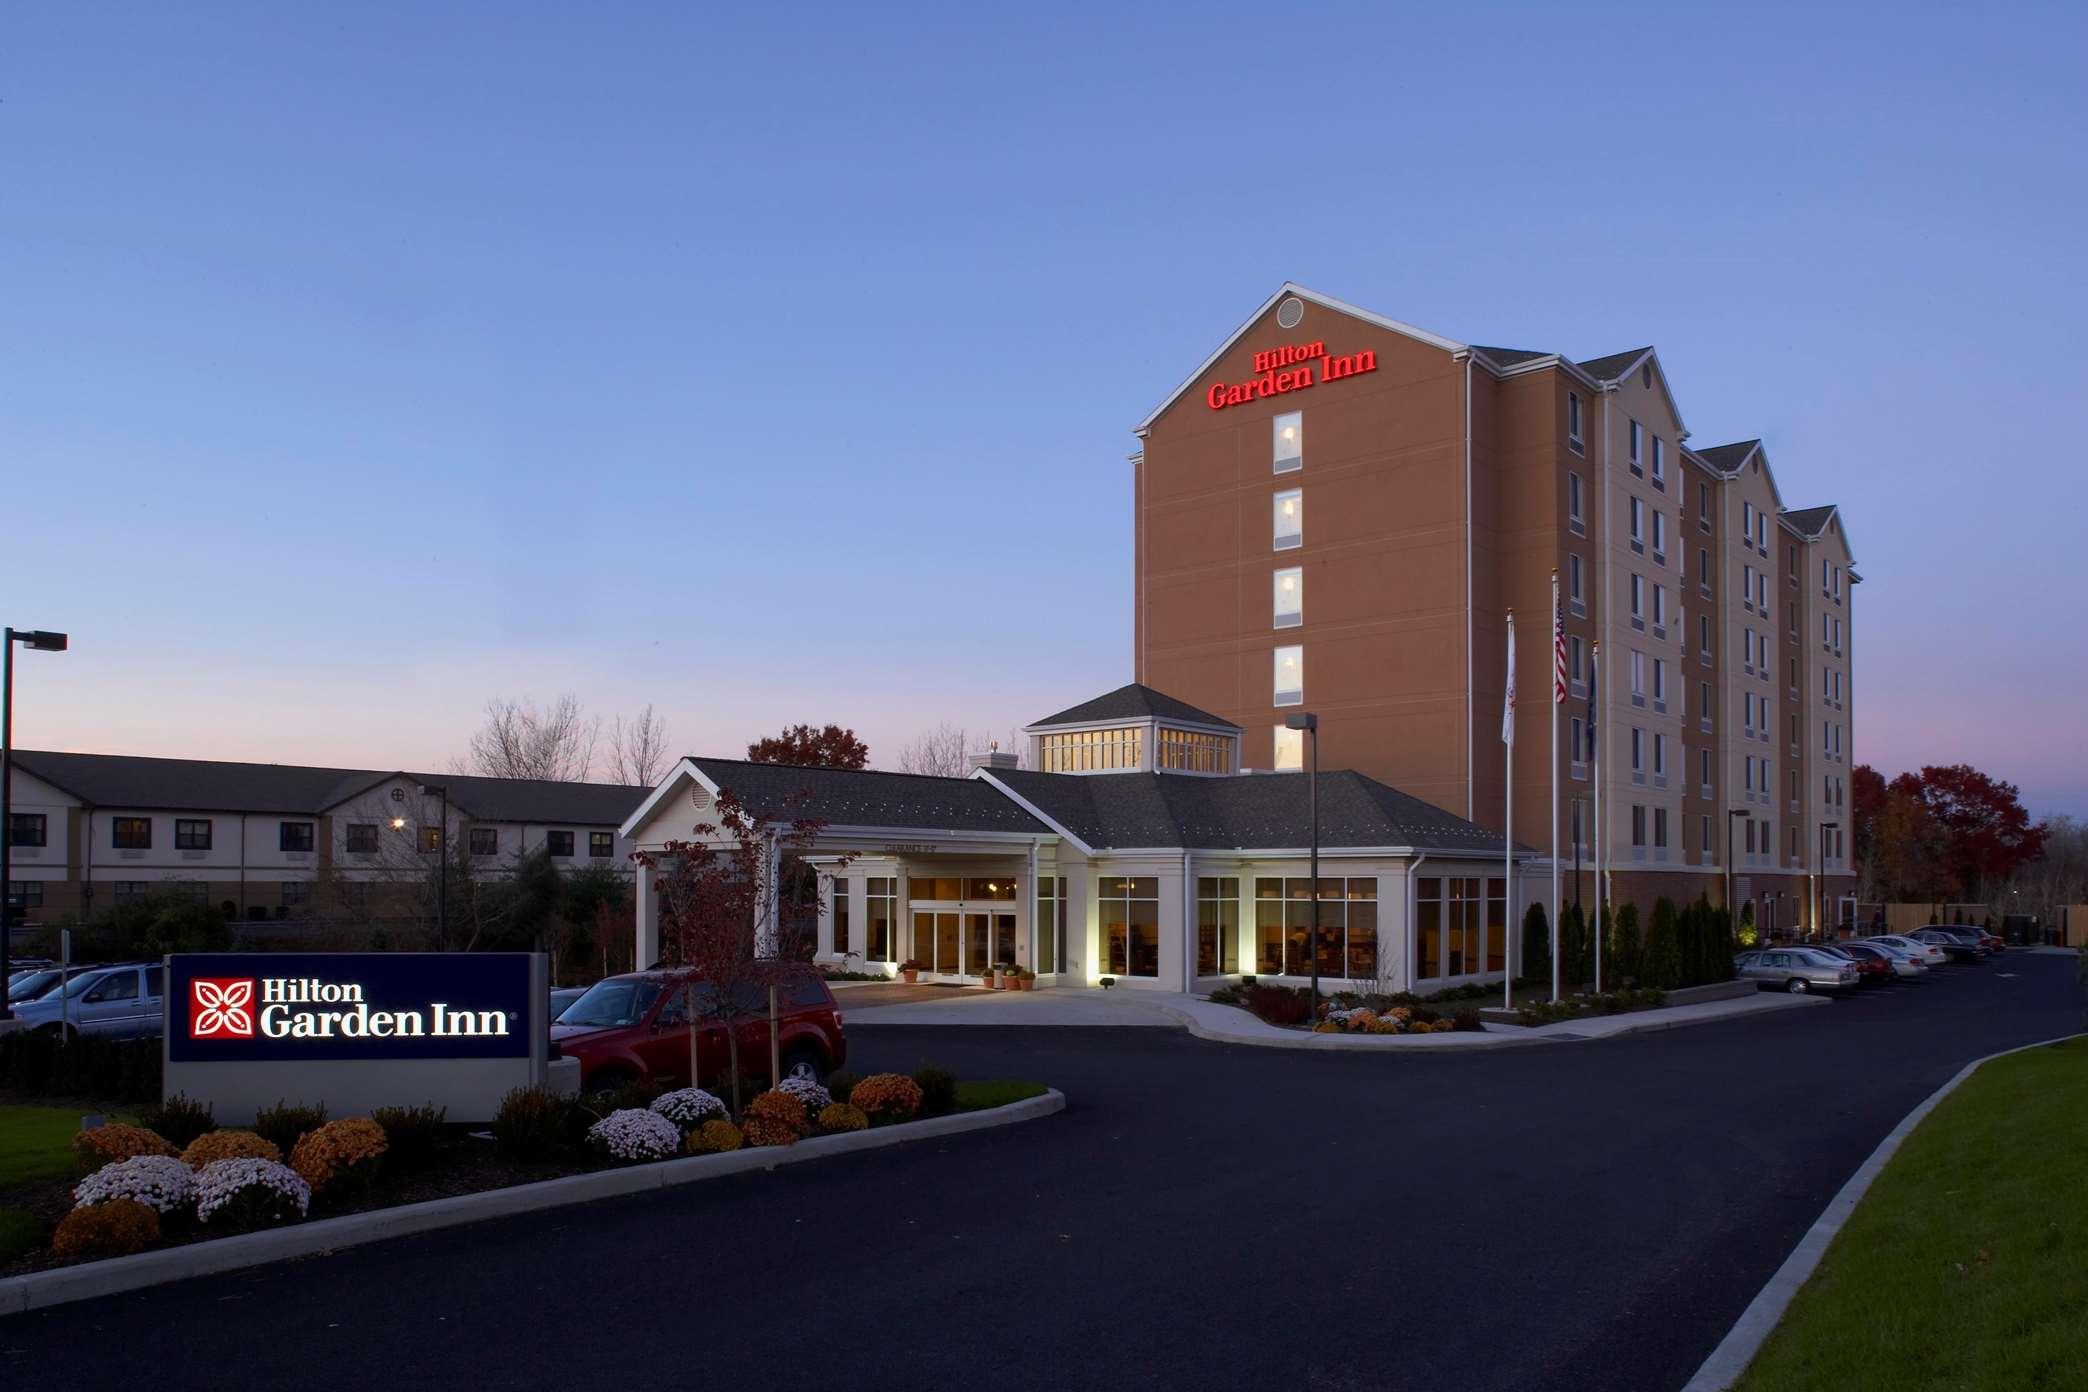 Hilton Garden Inn Albany/SUNY Area image 0